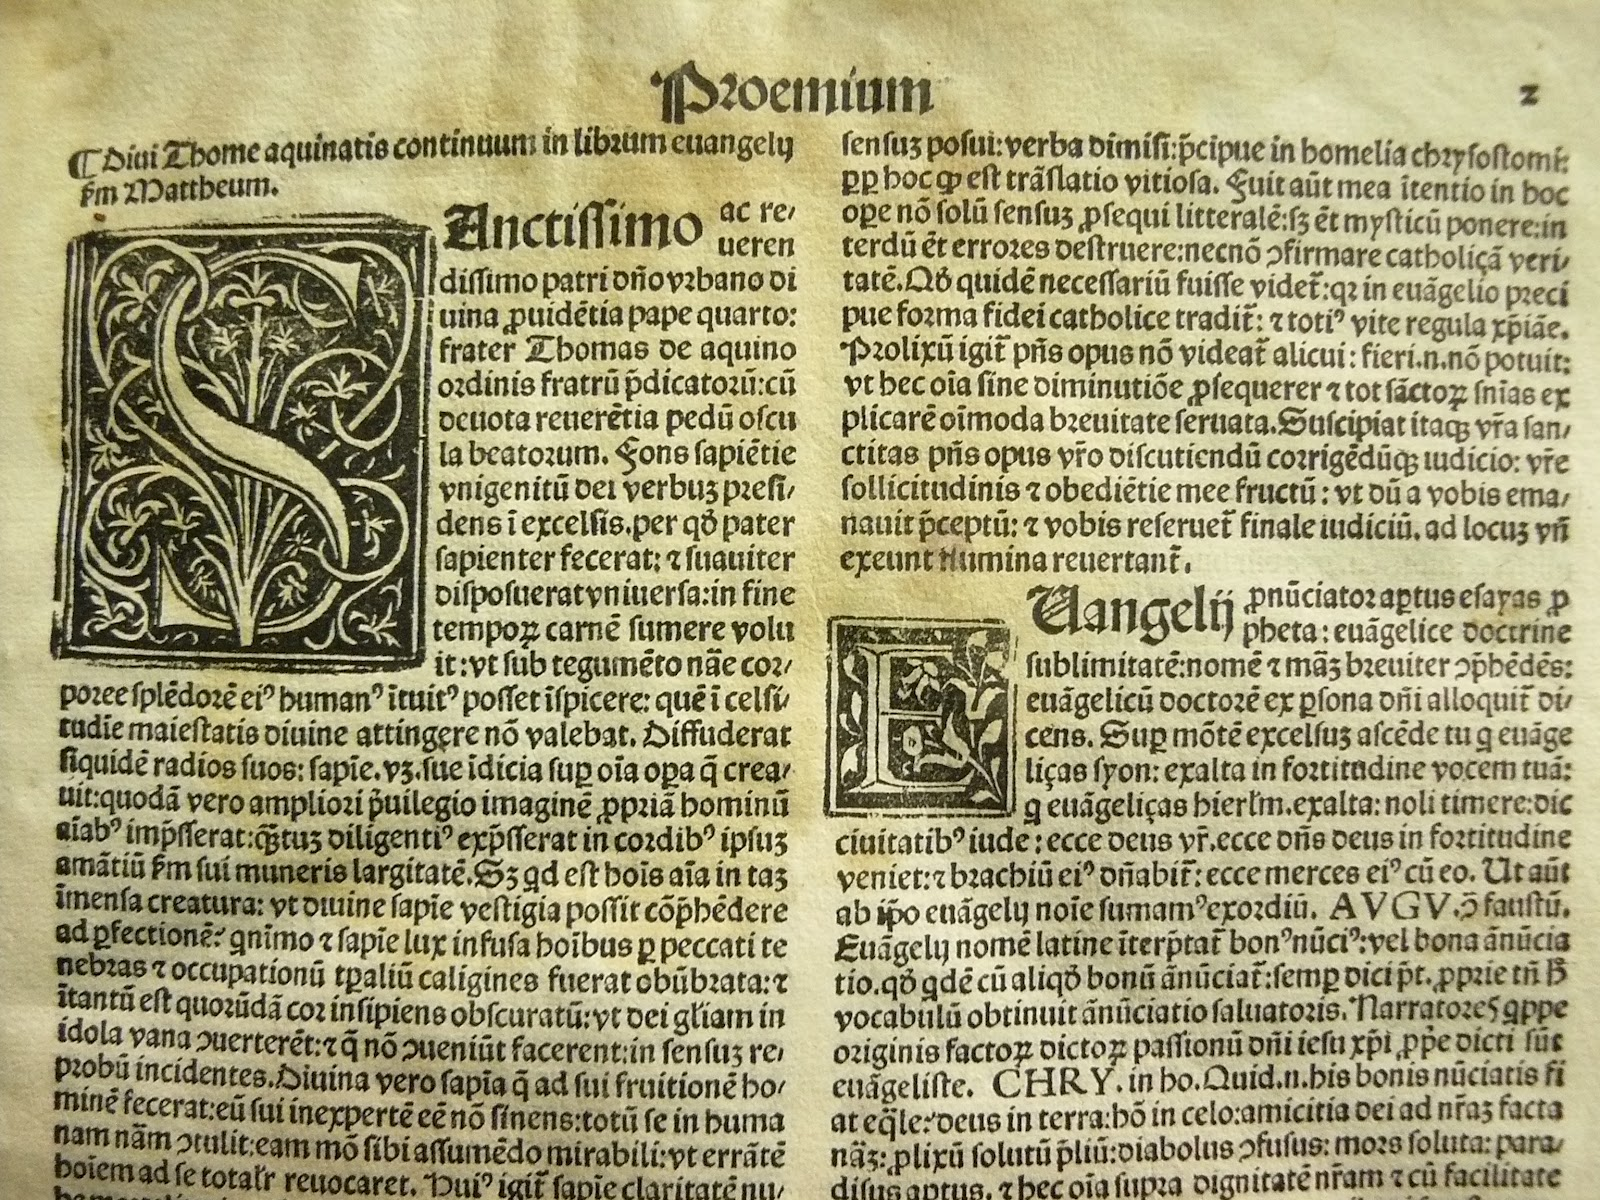 Biblioteca Patrimonial Recoleta Dominica: Reseñas de libros: \